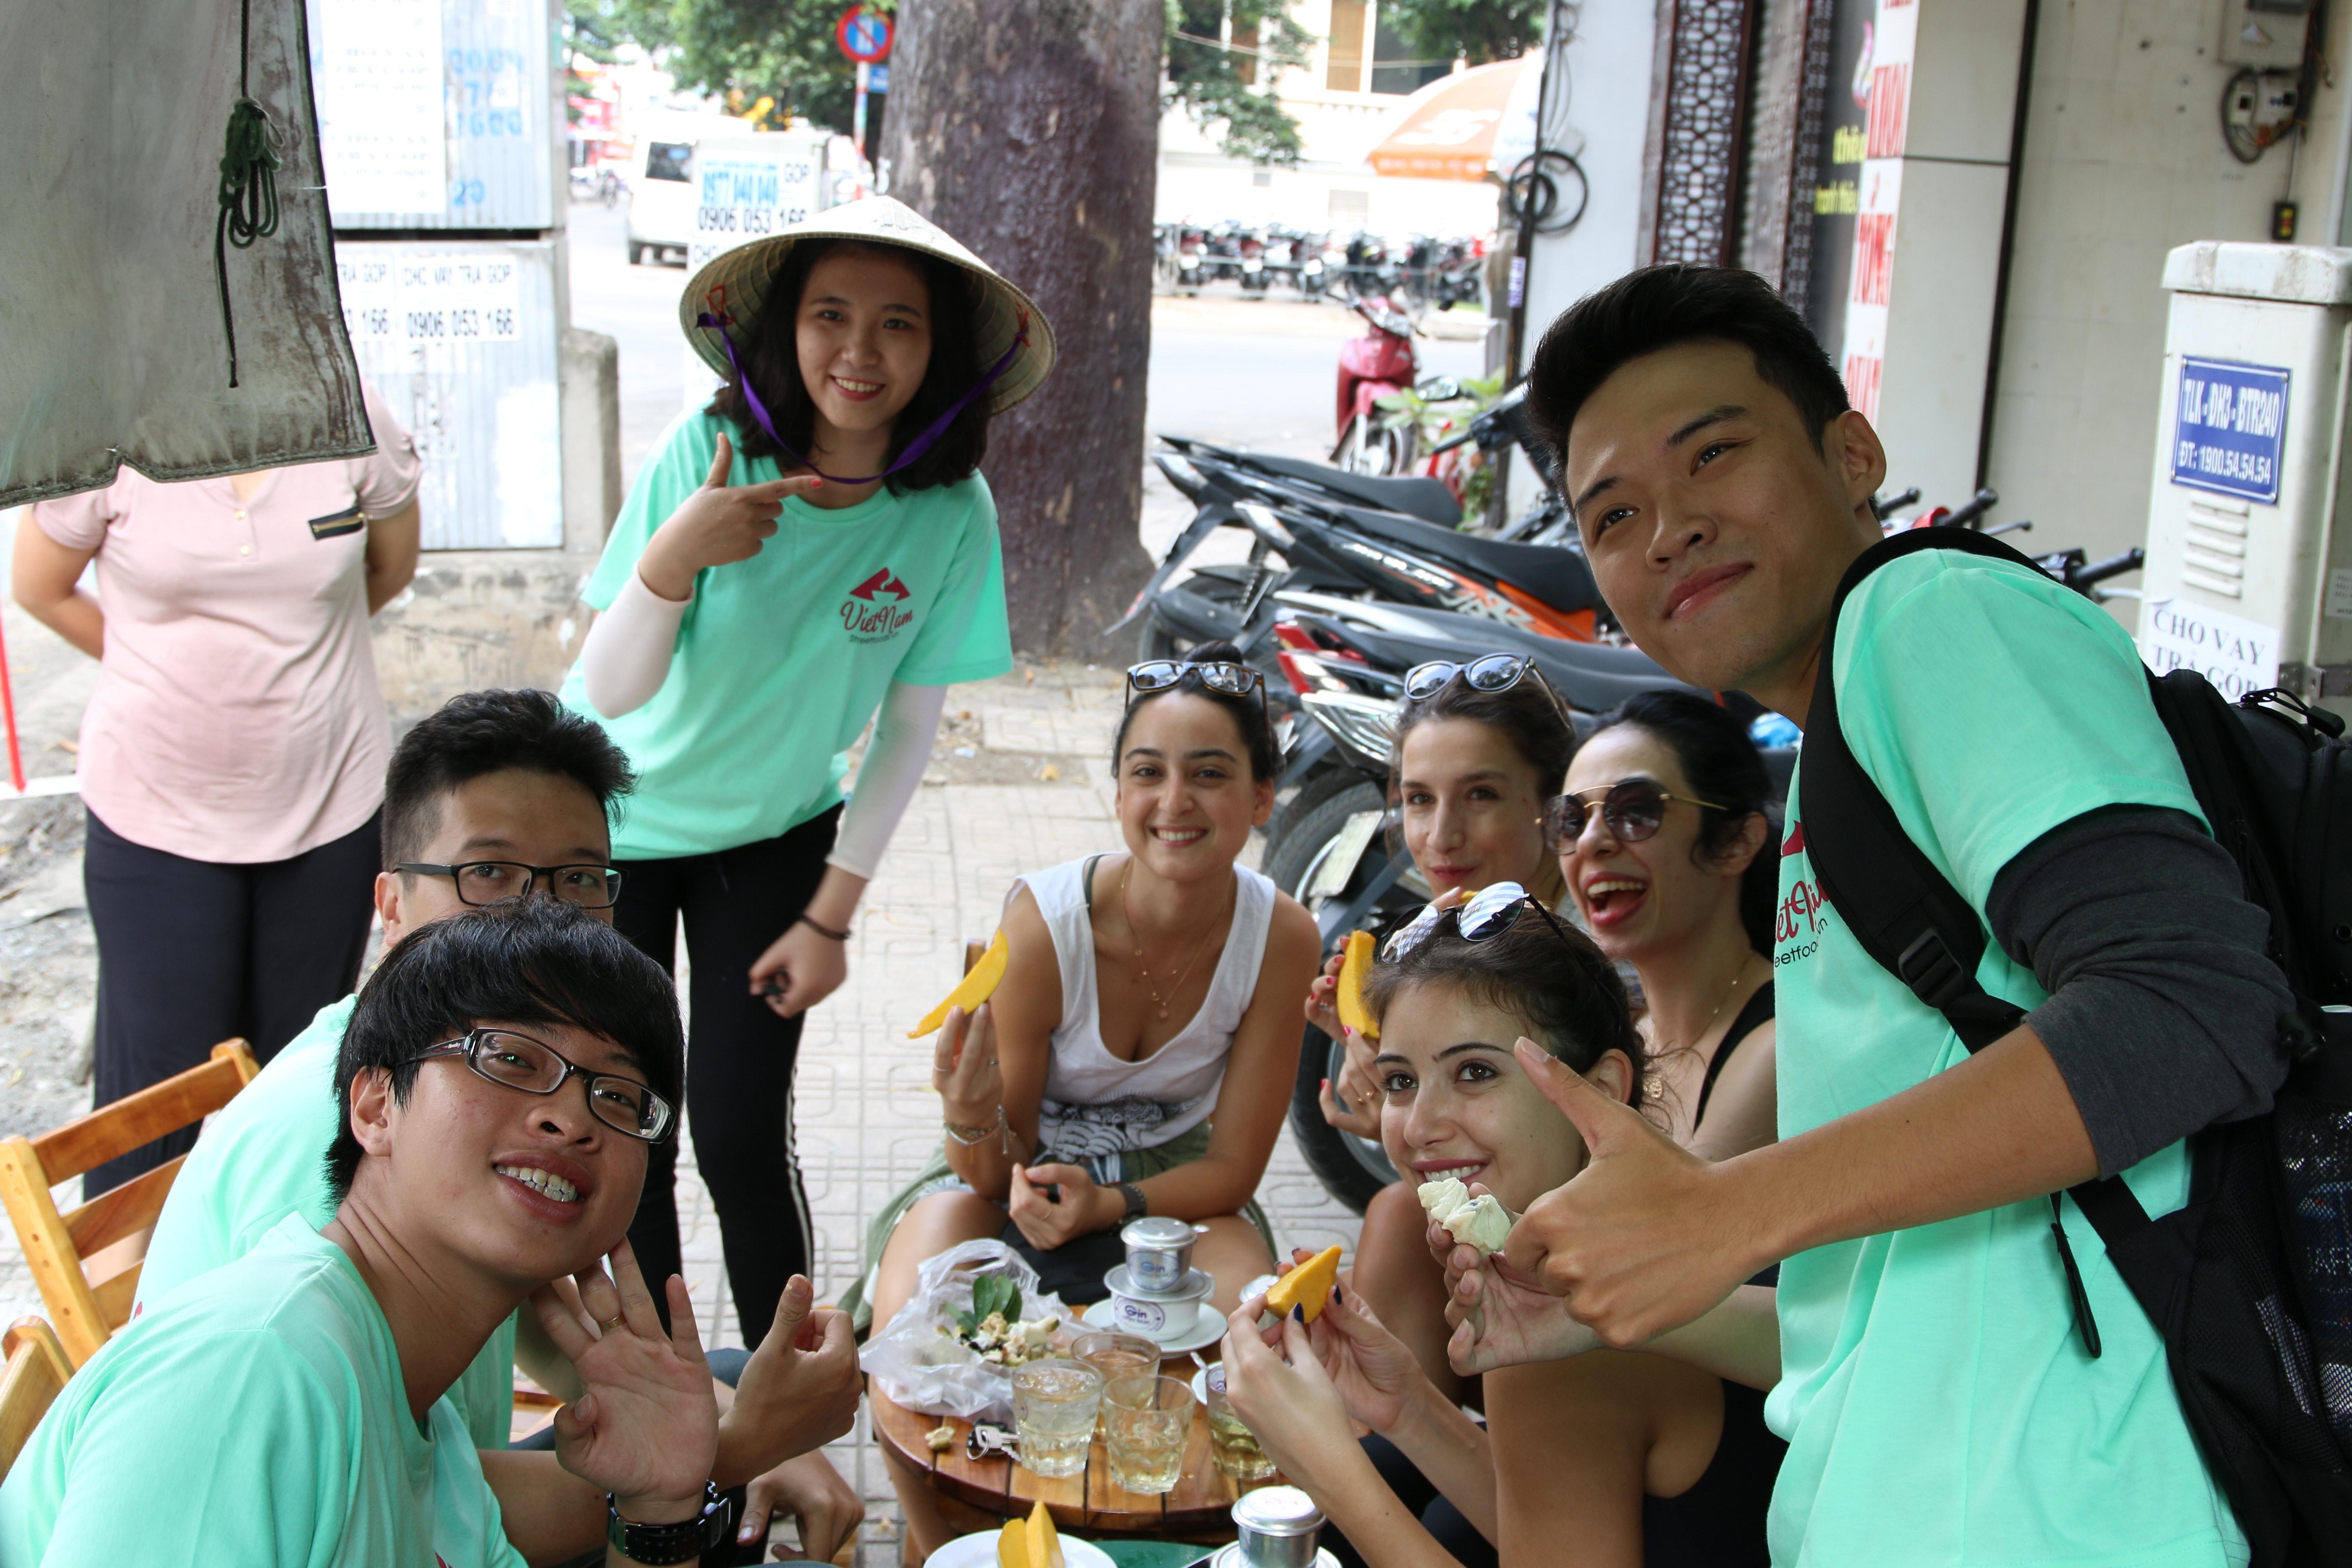 Vietnam Street Food Tours Vietnam Street Food Tours